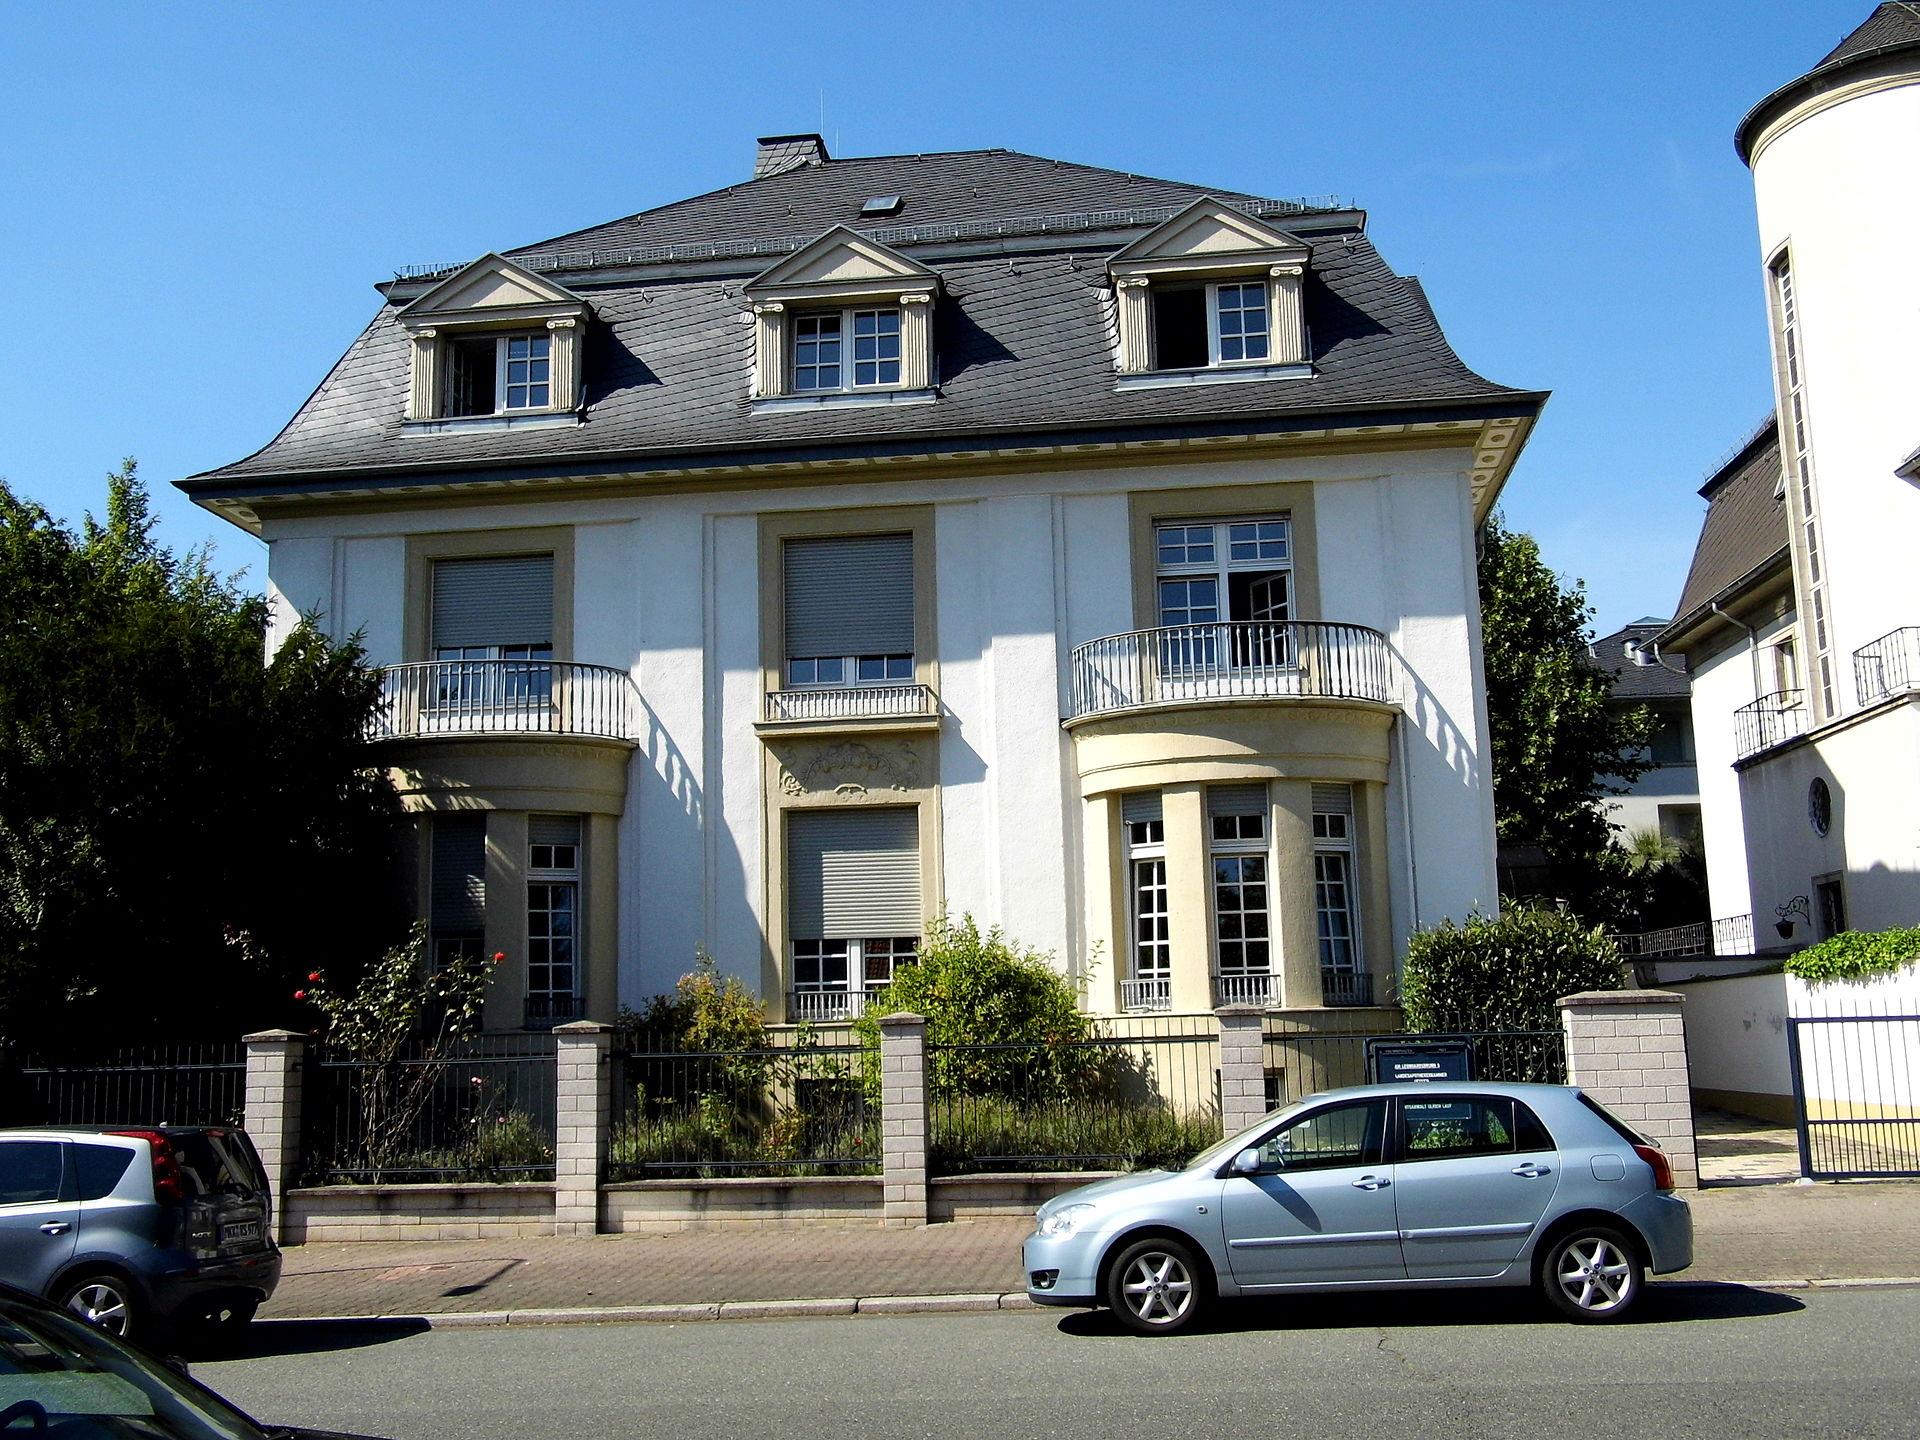 liste der kulturdenkm ler in frankfurt bockenheim wikipedia. Black Bedroom Furniture Sets. Home Design Ideas